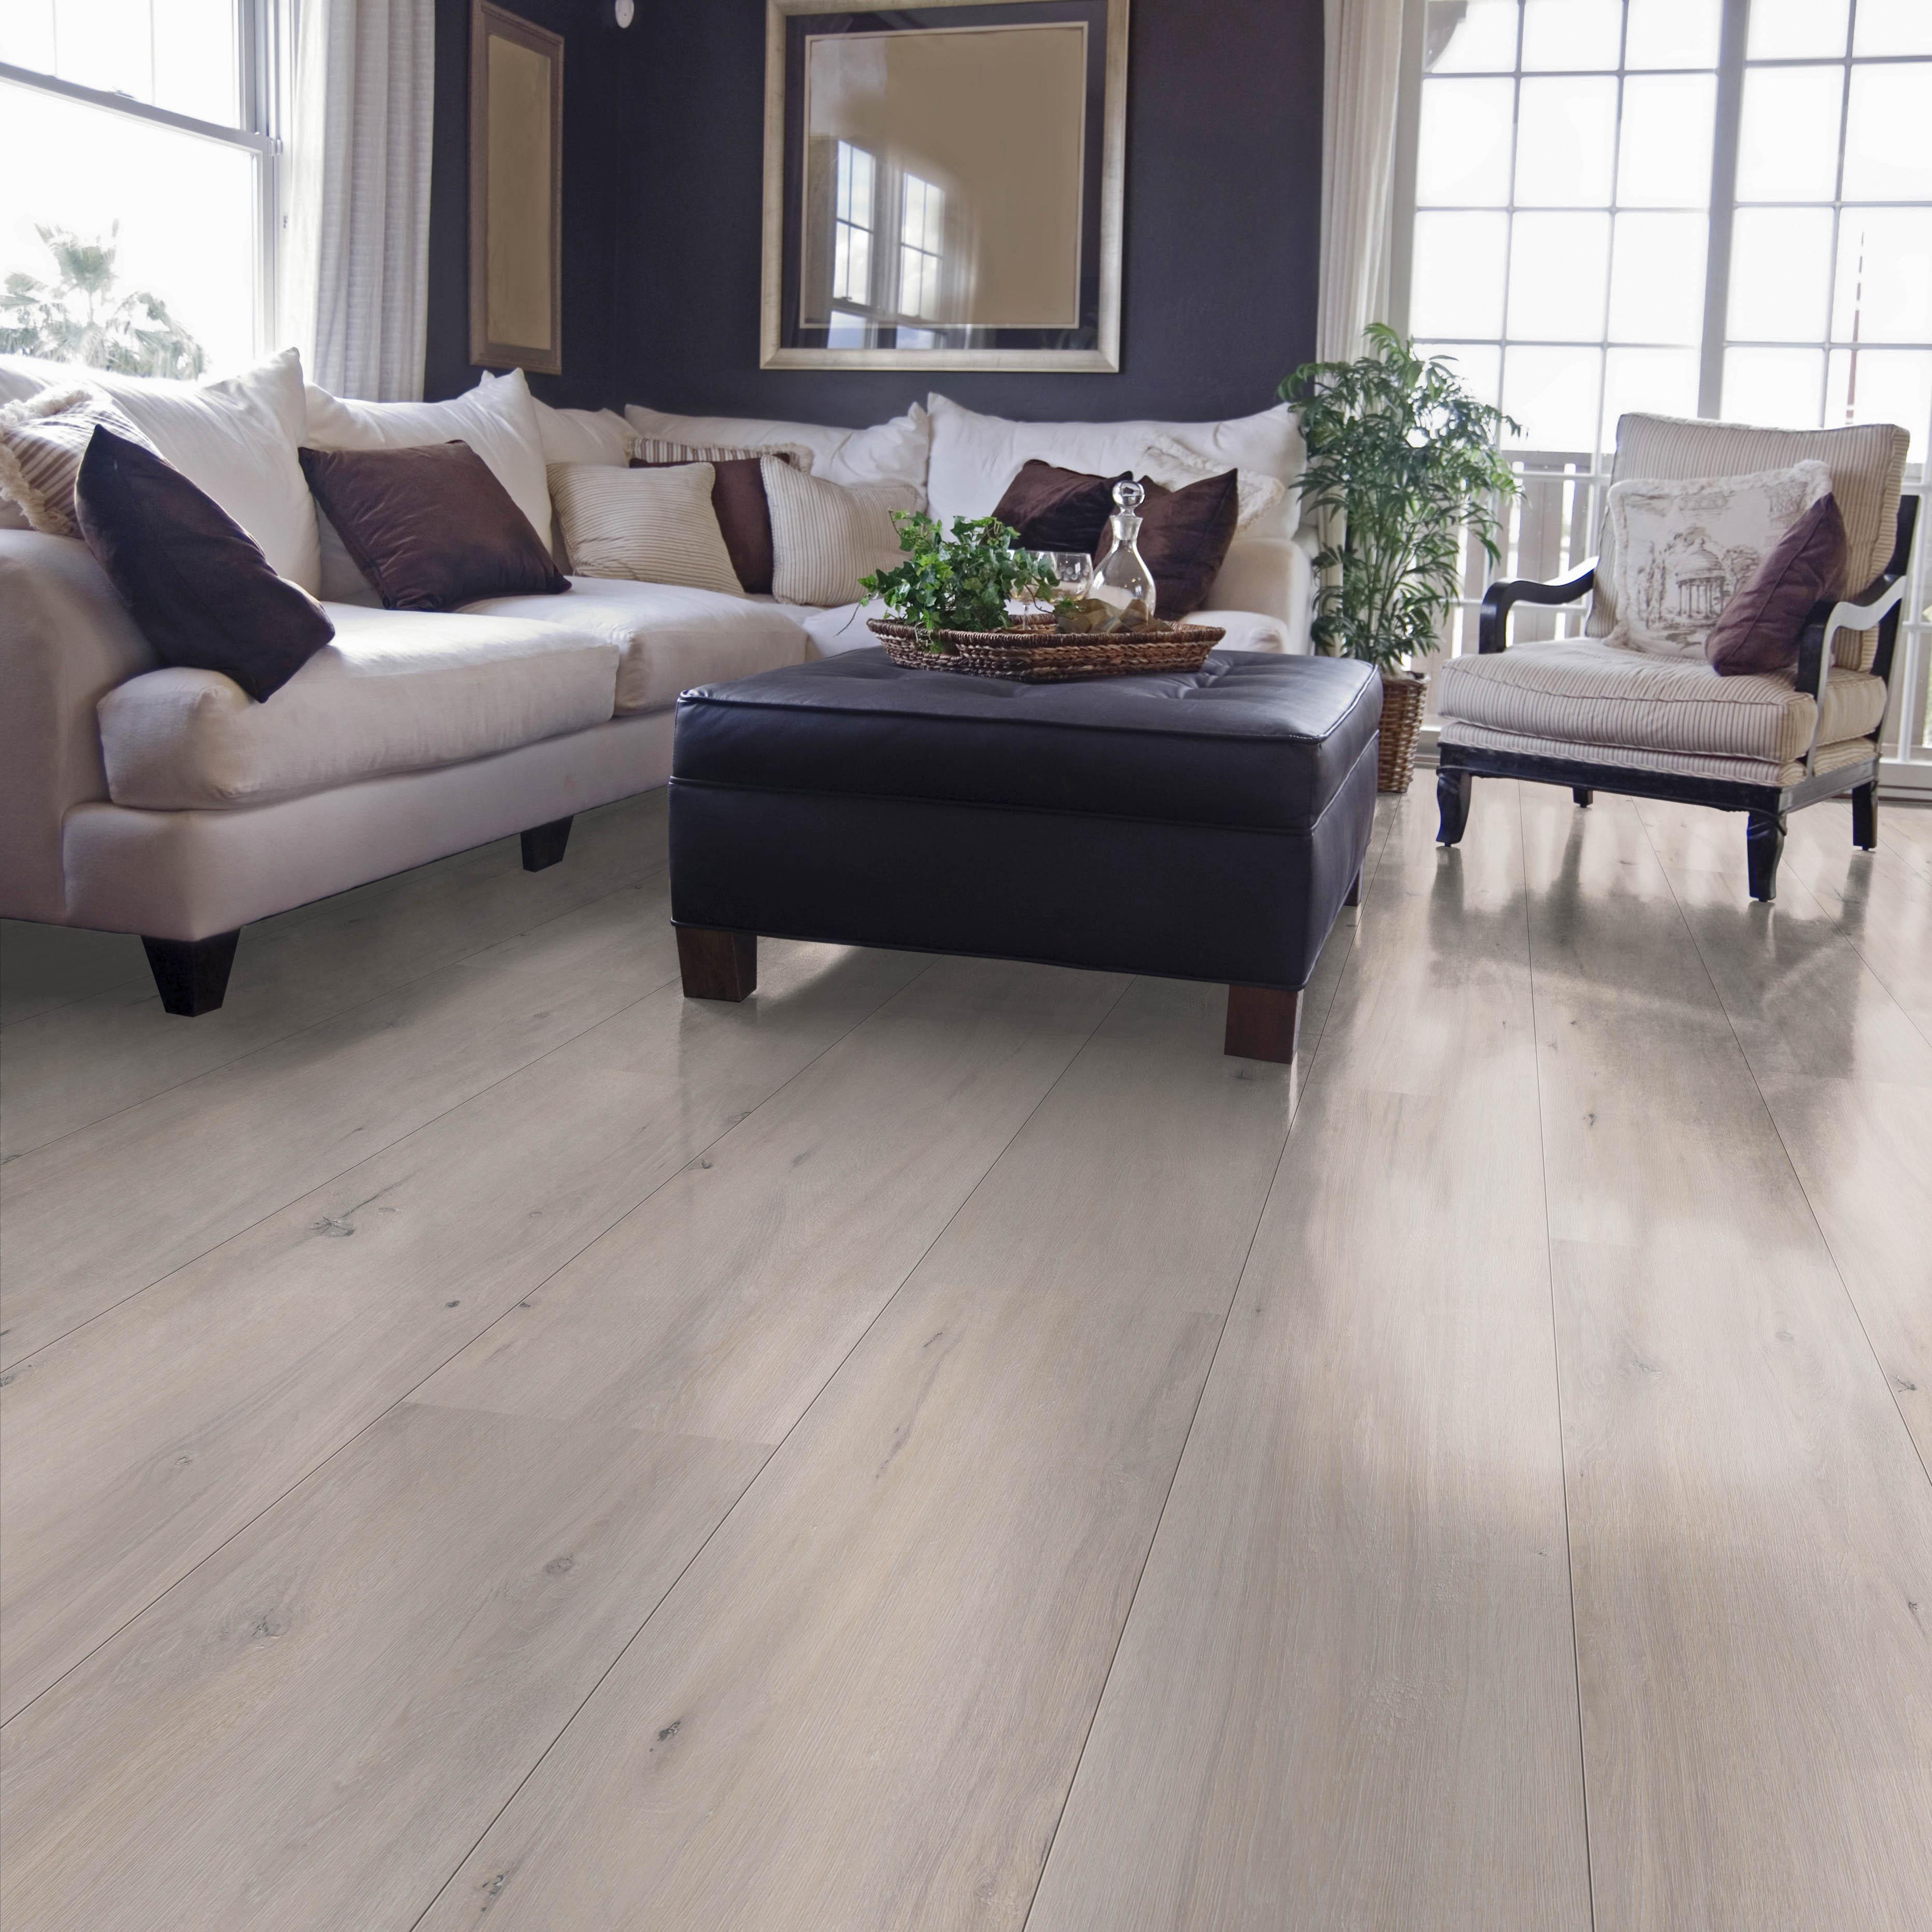 Floor Types Home Laminate 8 Mm Oak Whitewashed Light